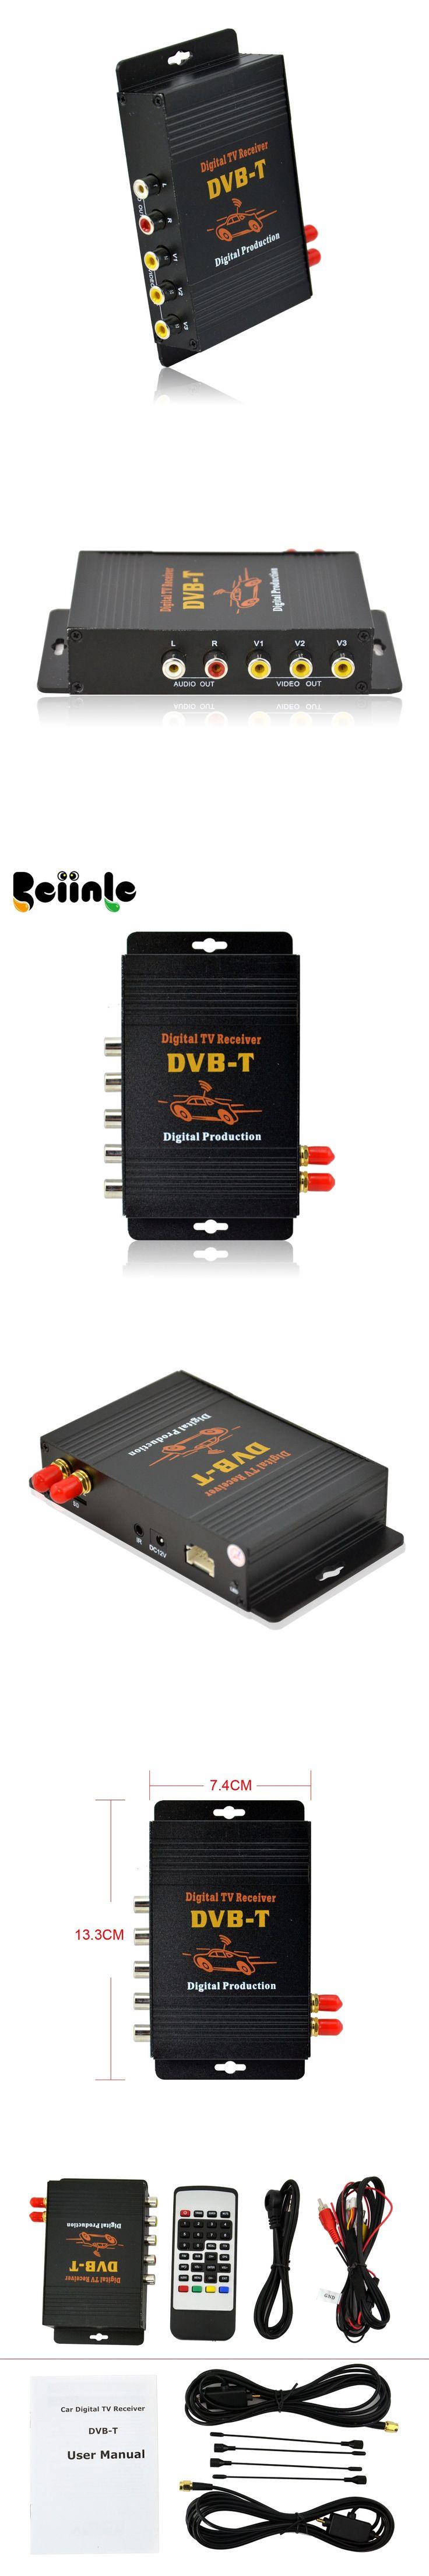 Car Four Tuner Way Dual Antenna DVB-T(MPEG-4)   Digital  TV receiver  for Thailand..etc